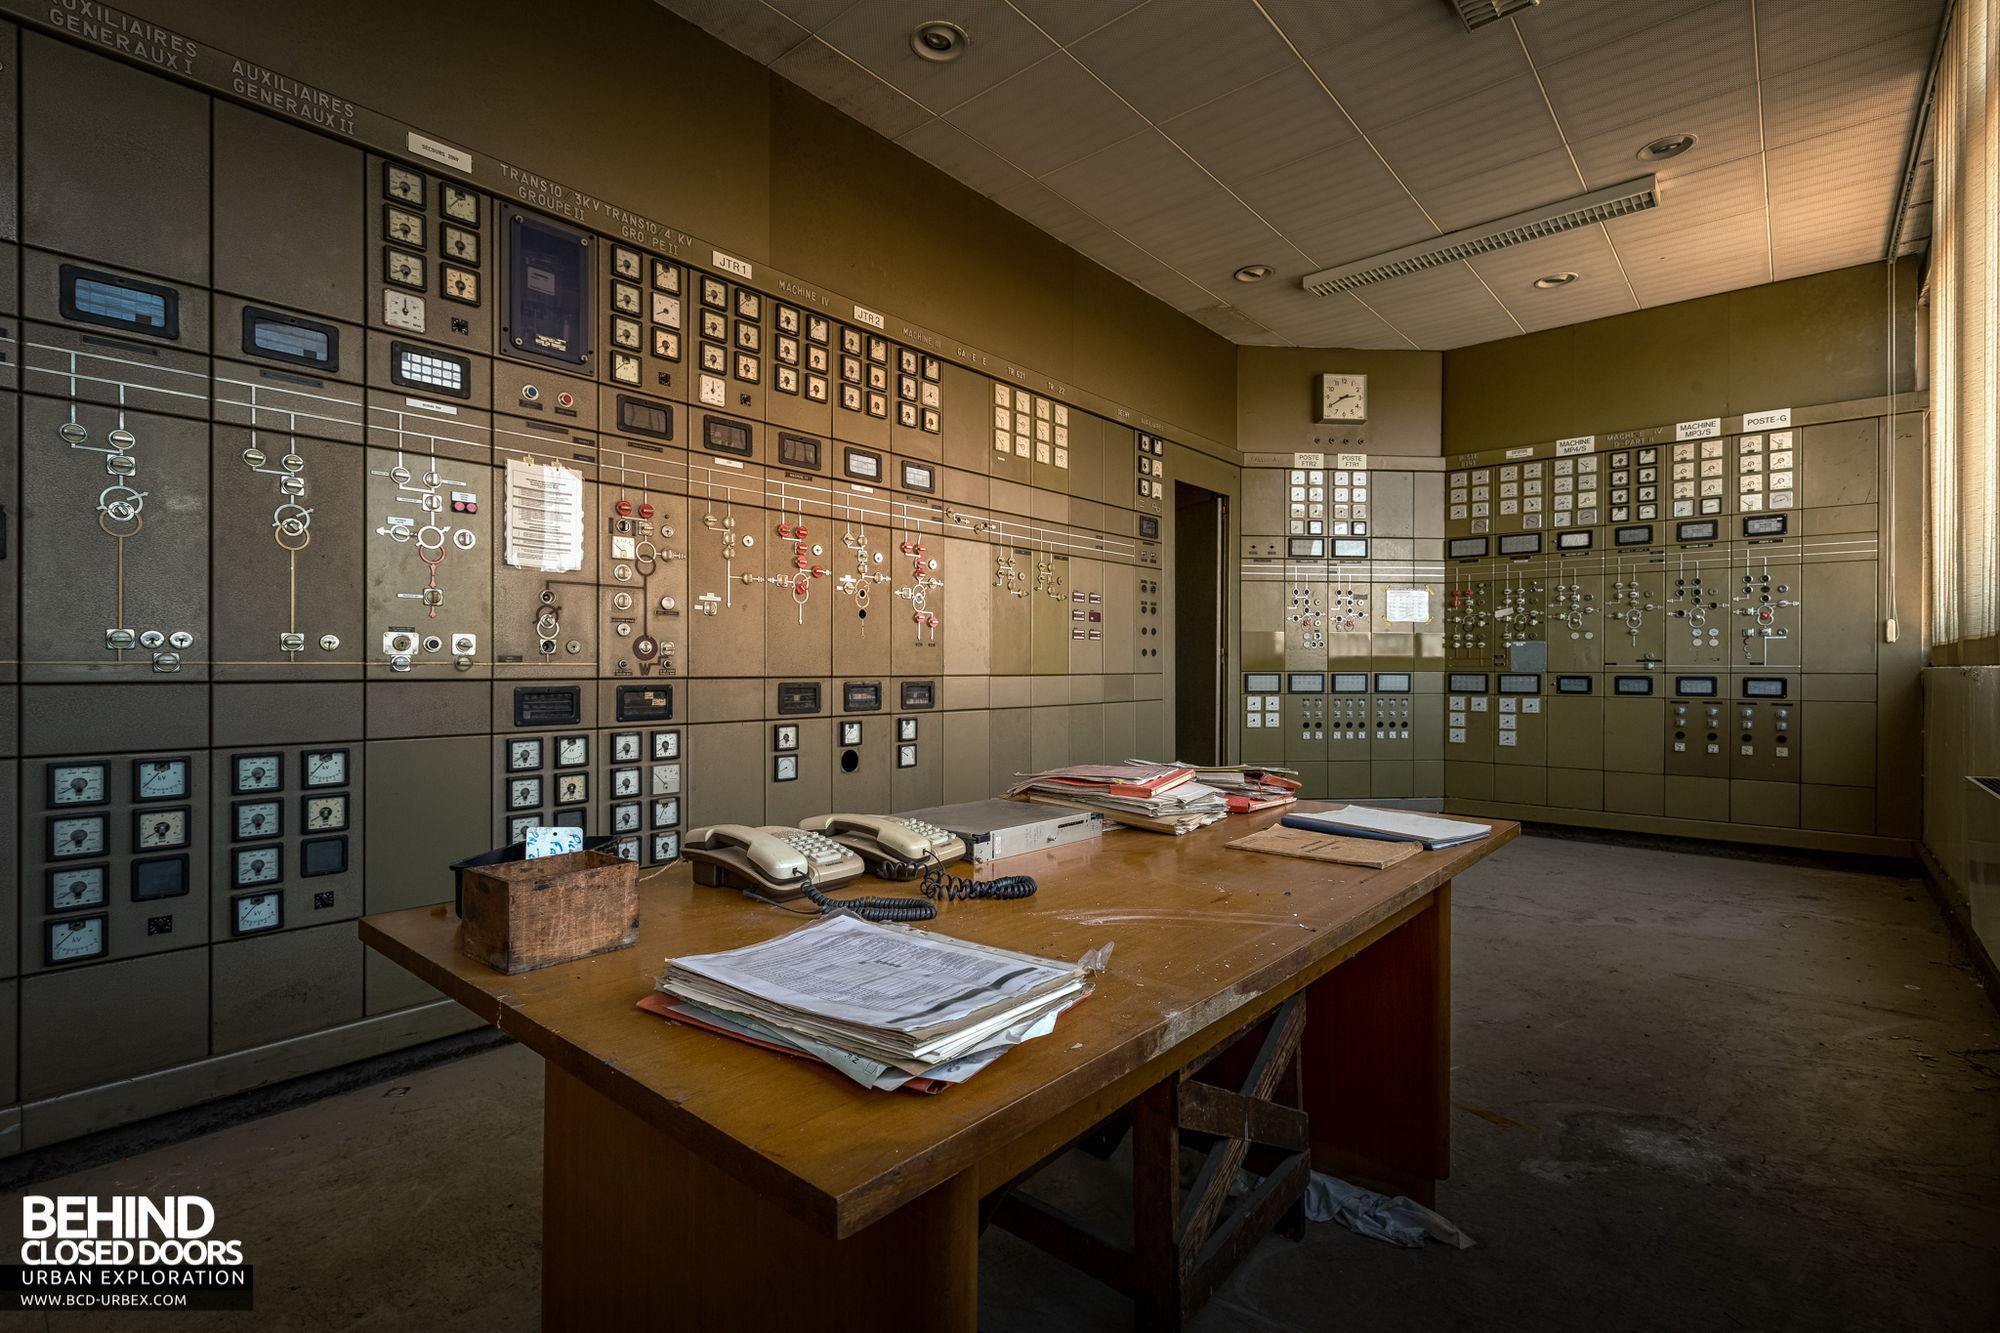 Stora Enso, Corbehem - Substation control room